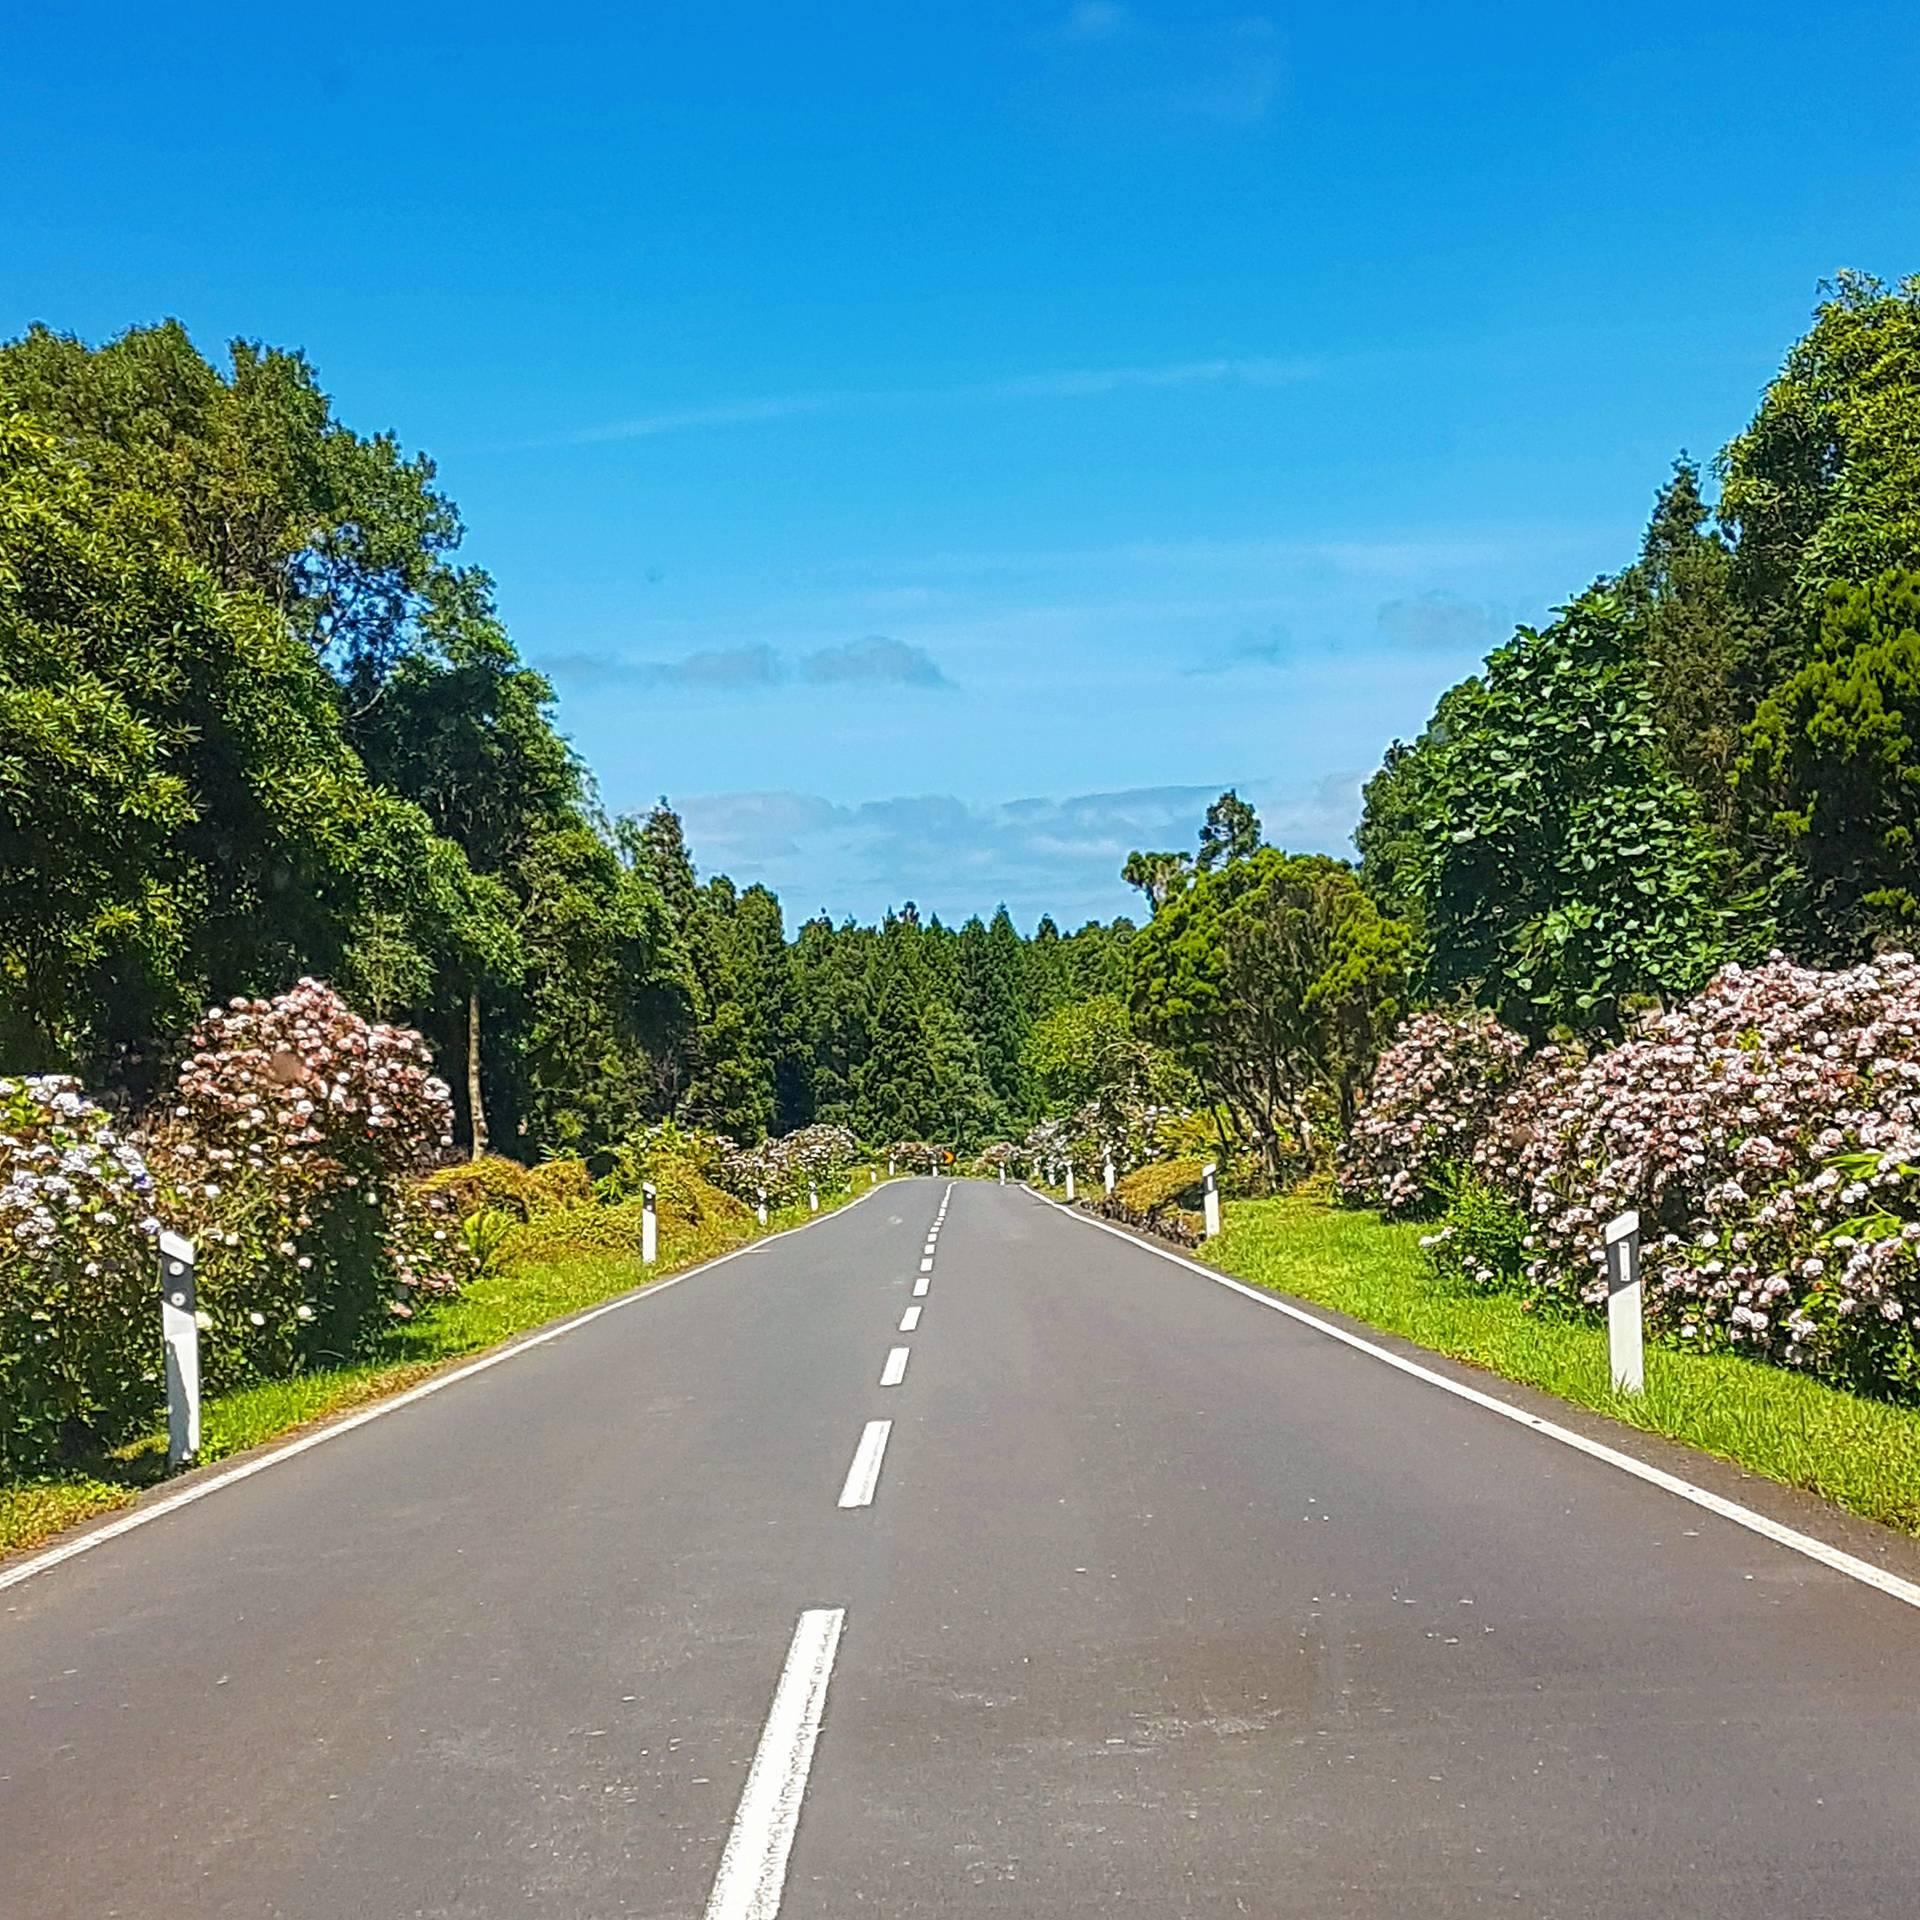 Road with Hydrangeas Flowers